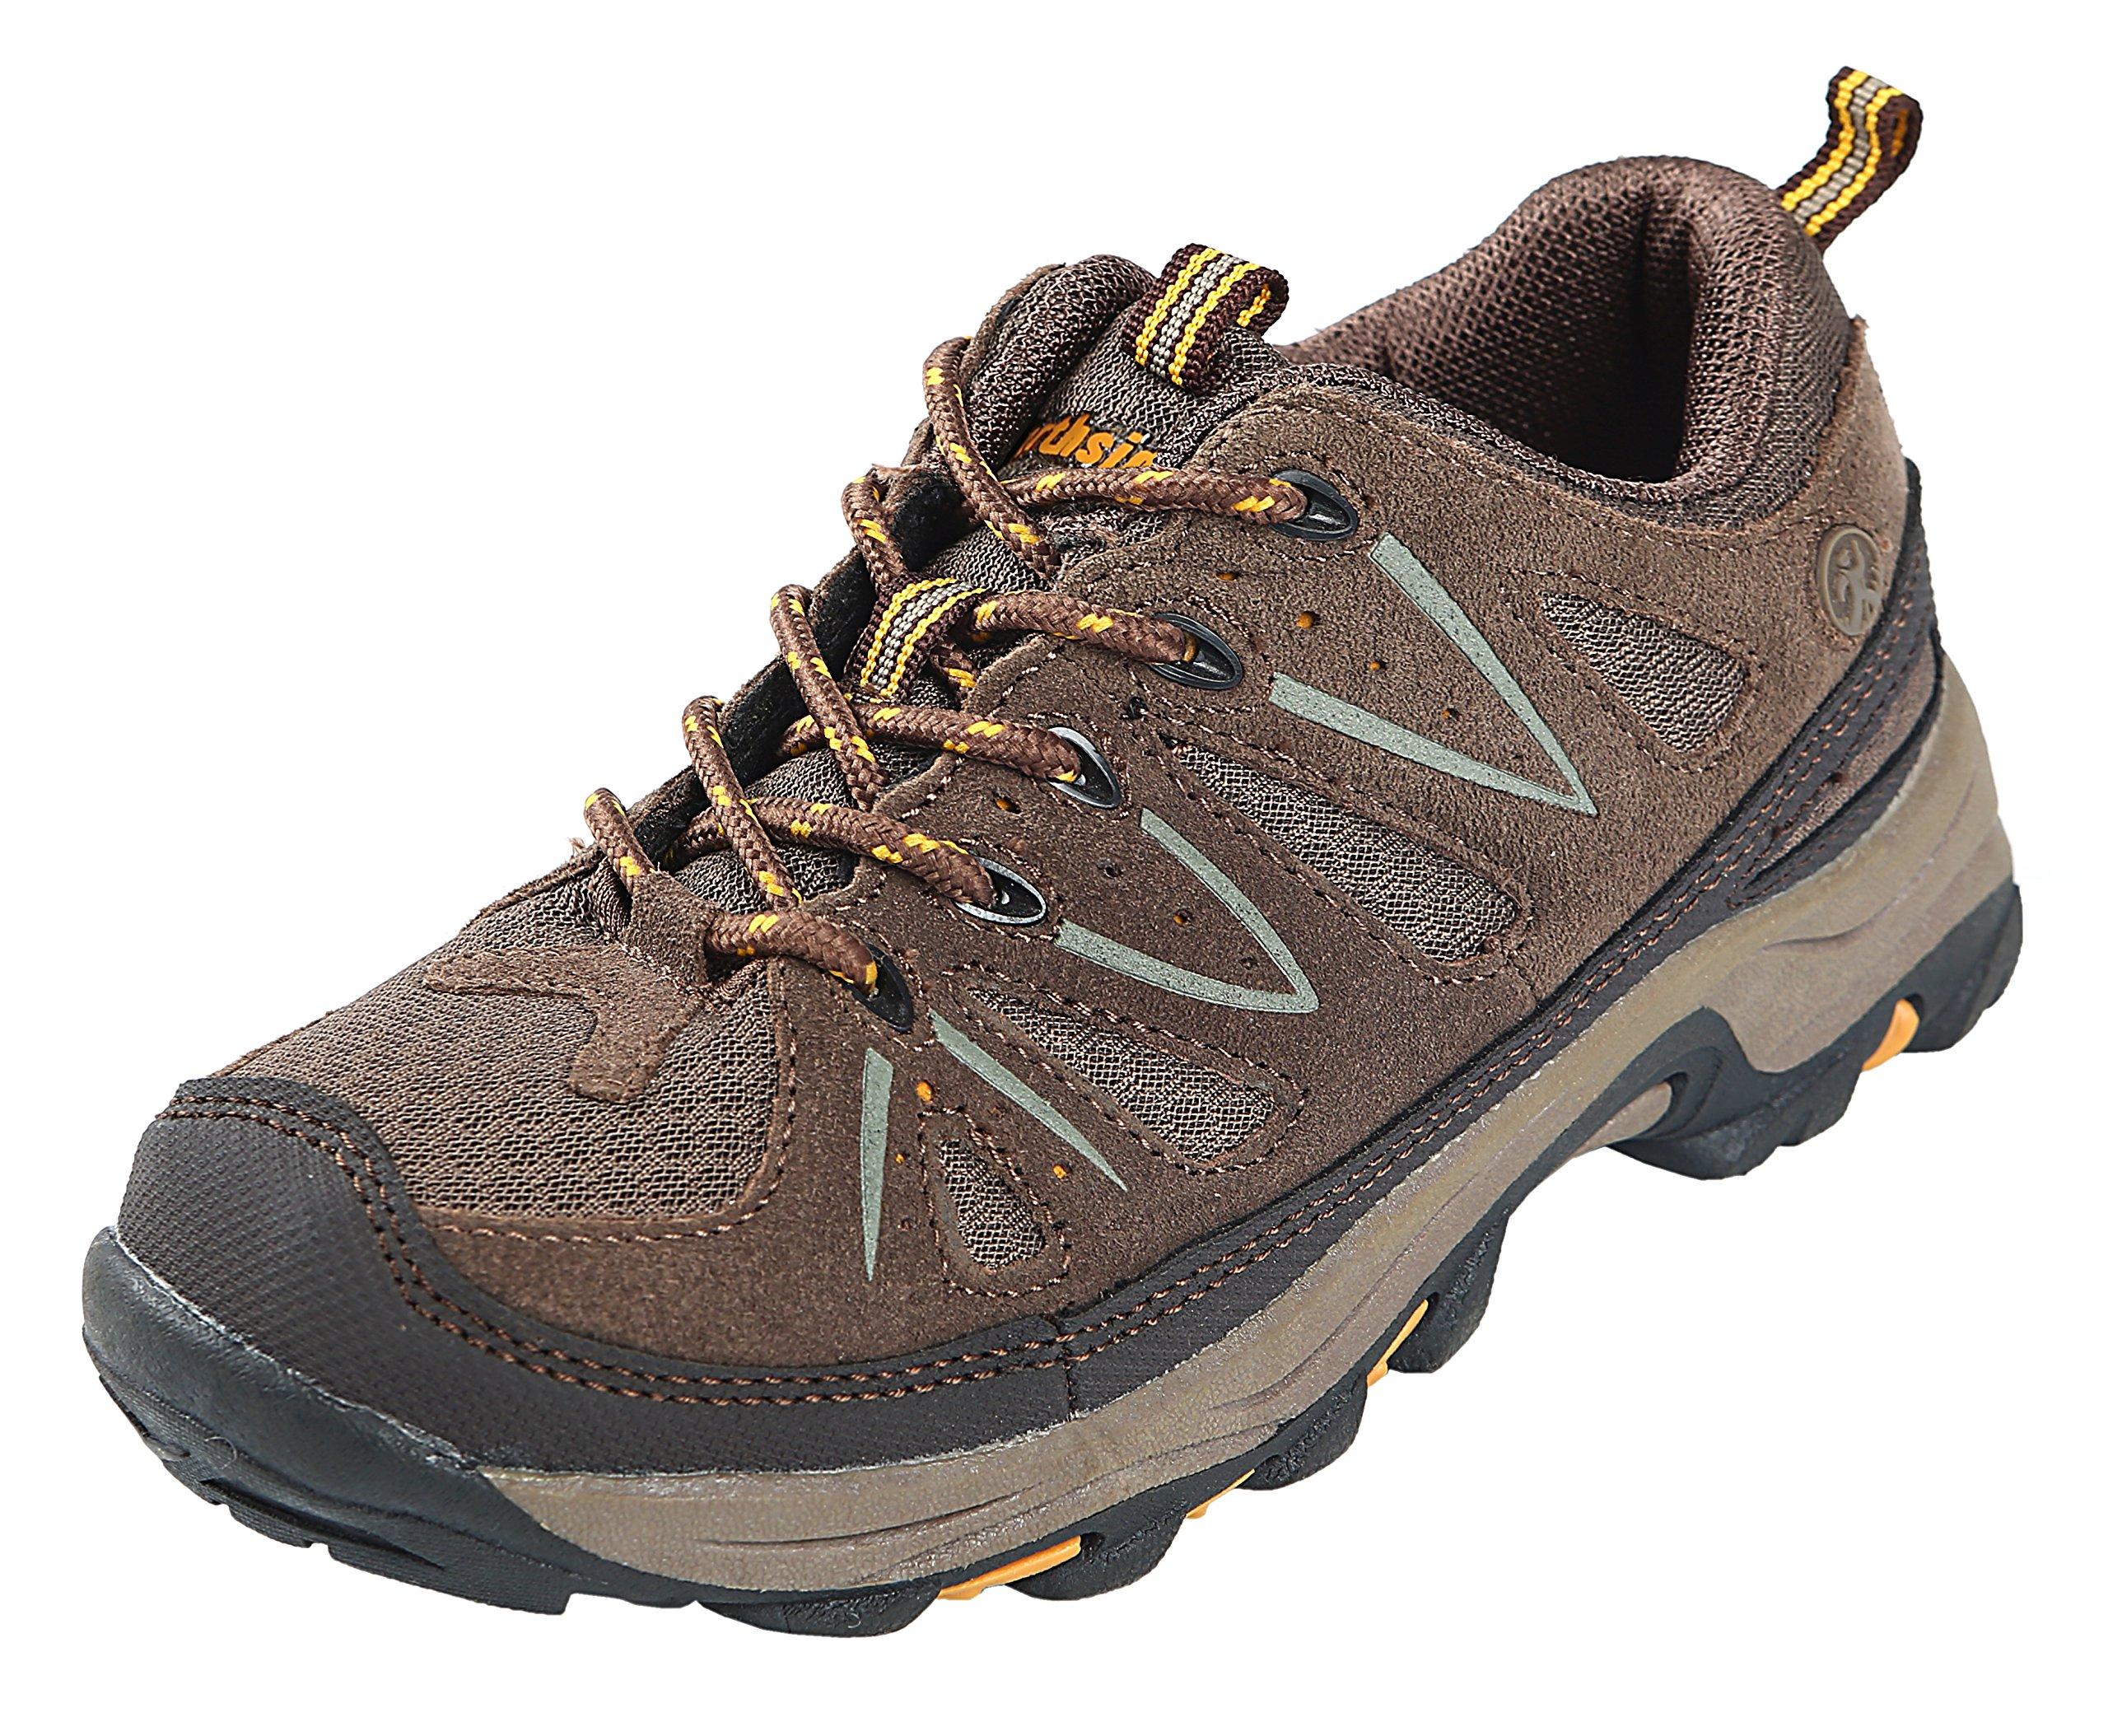 Northside Unisex Cheyenne Jr Hiking Shoe, Taupe/Mango, 7 Wide US Big Kid